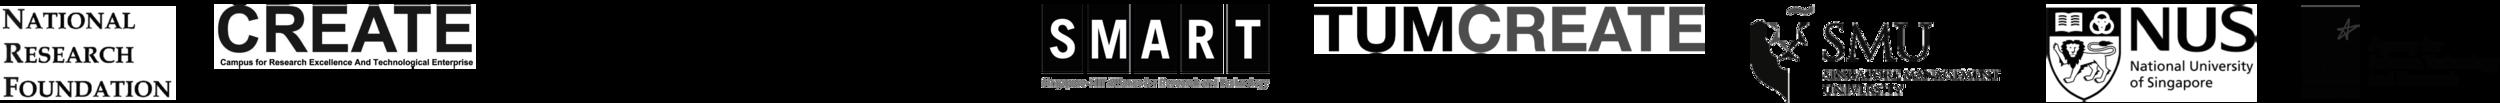 Logo_CS partners_CS15_with sponsor_NEW.png